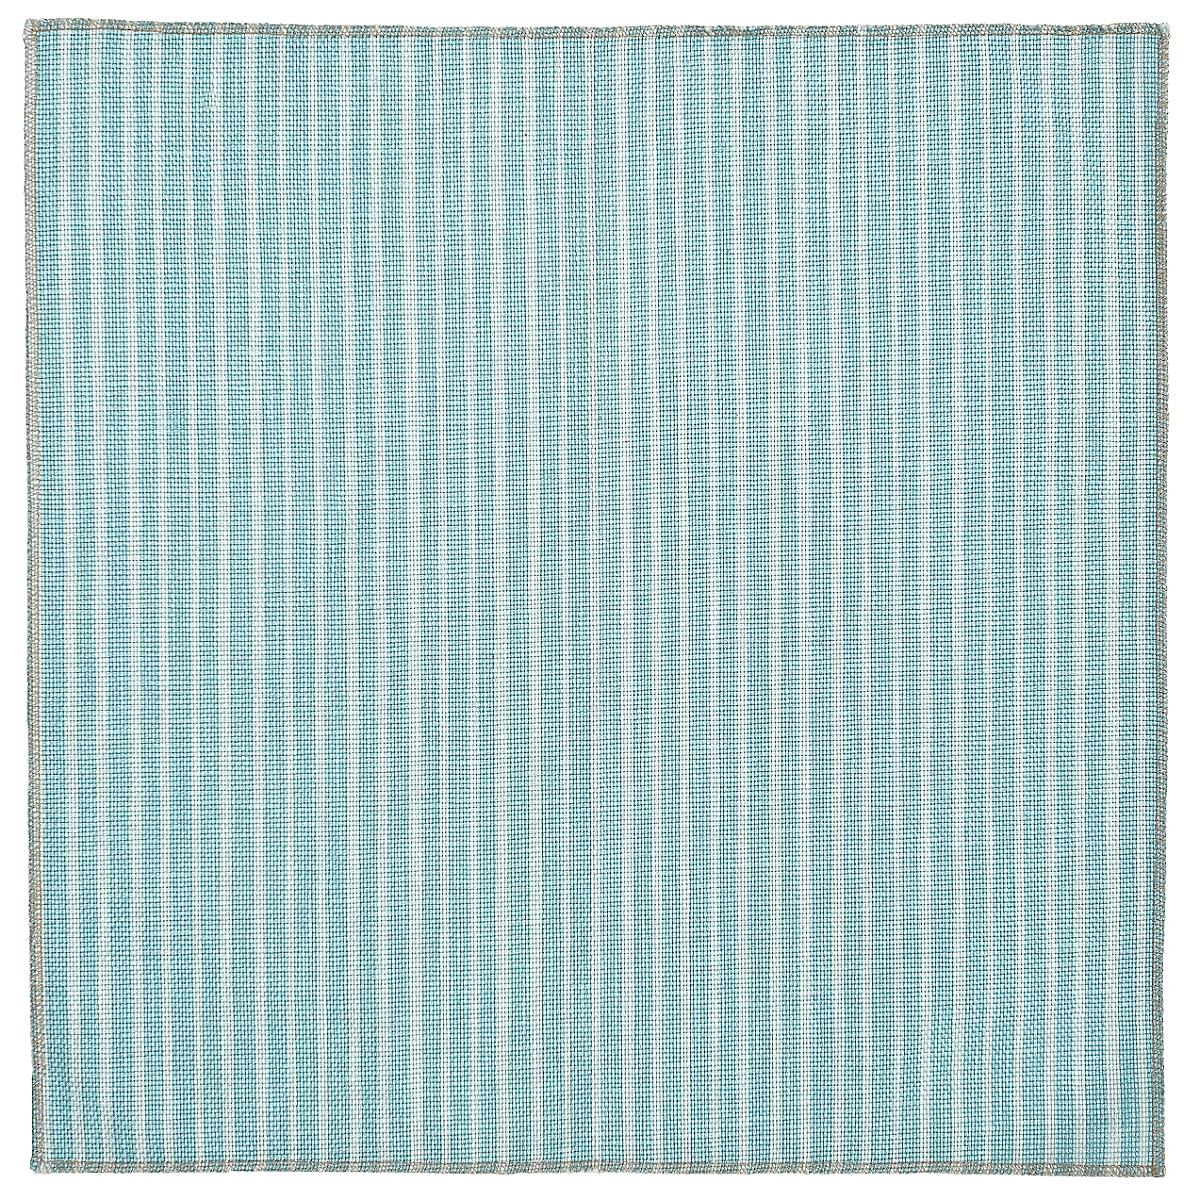 Stripe Tease: Porch (fabric yardage)